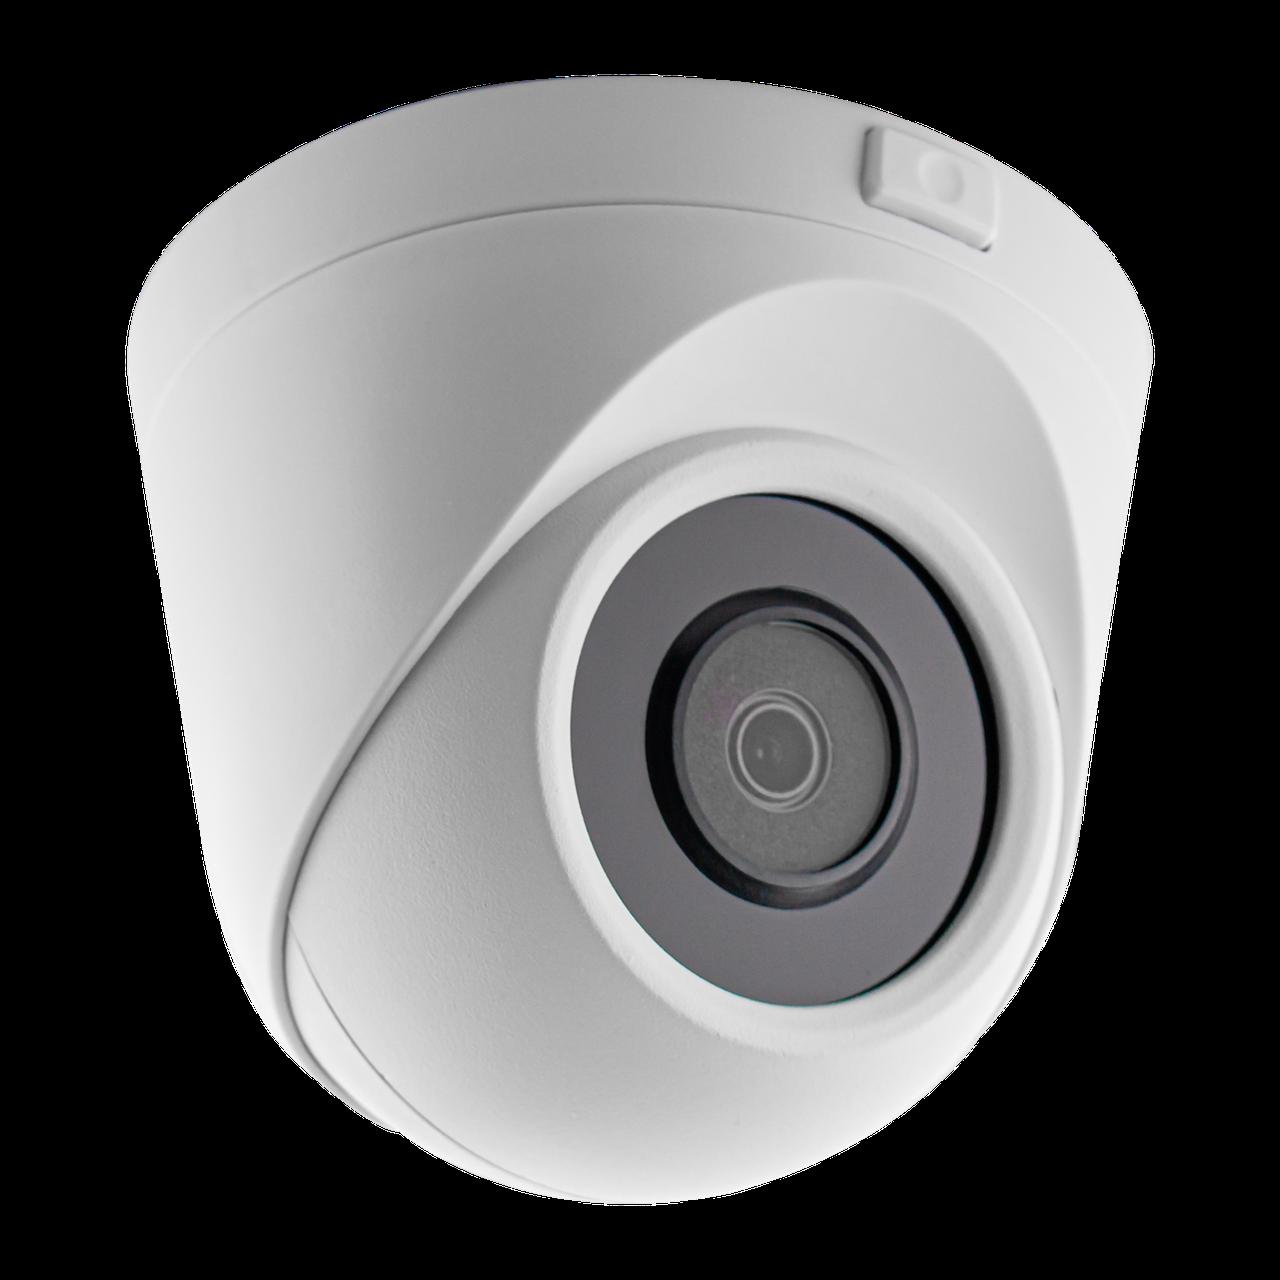 Антивандальная IP камера GreenVision GV-109-IP-E-DOF50-30 POE 5MP (Ultra)